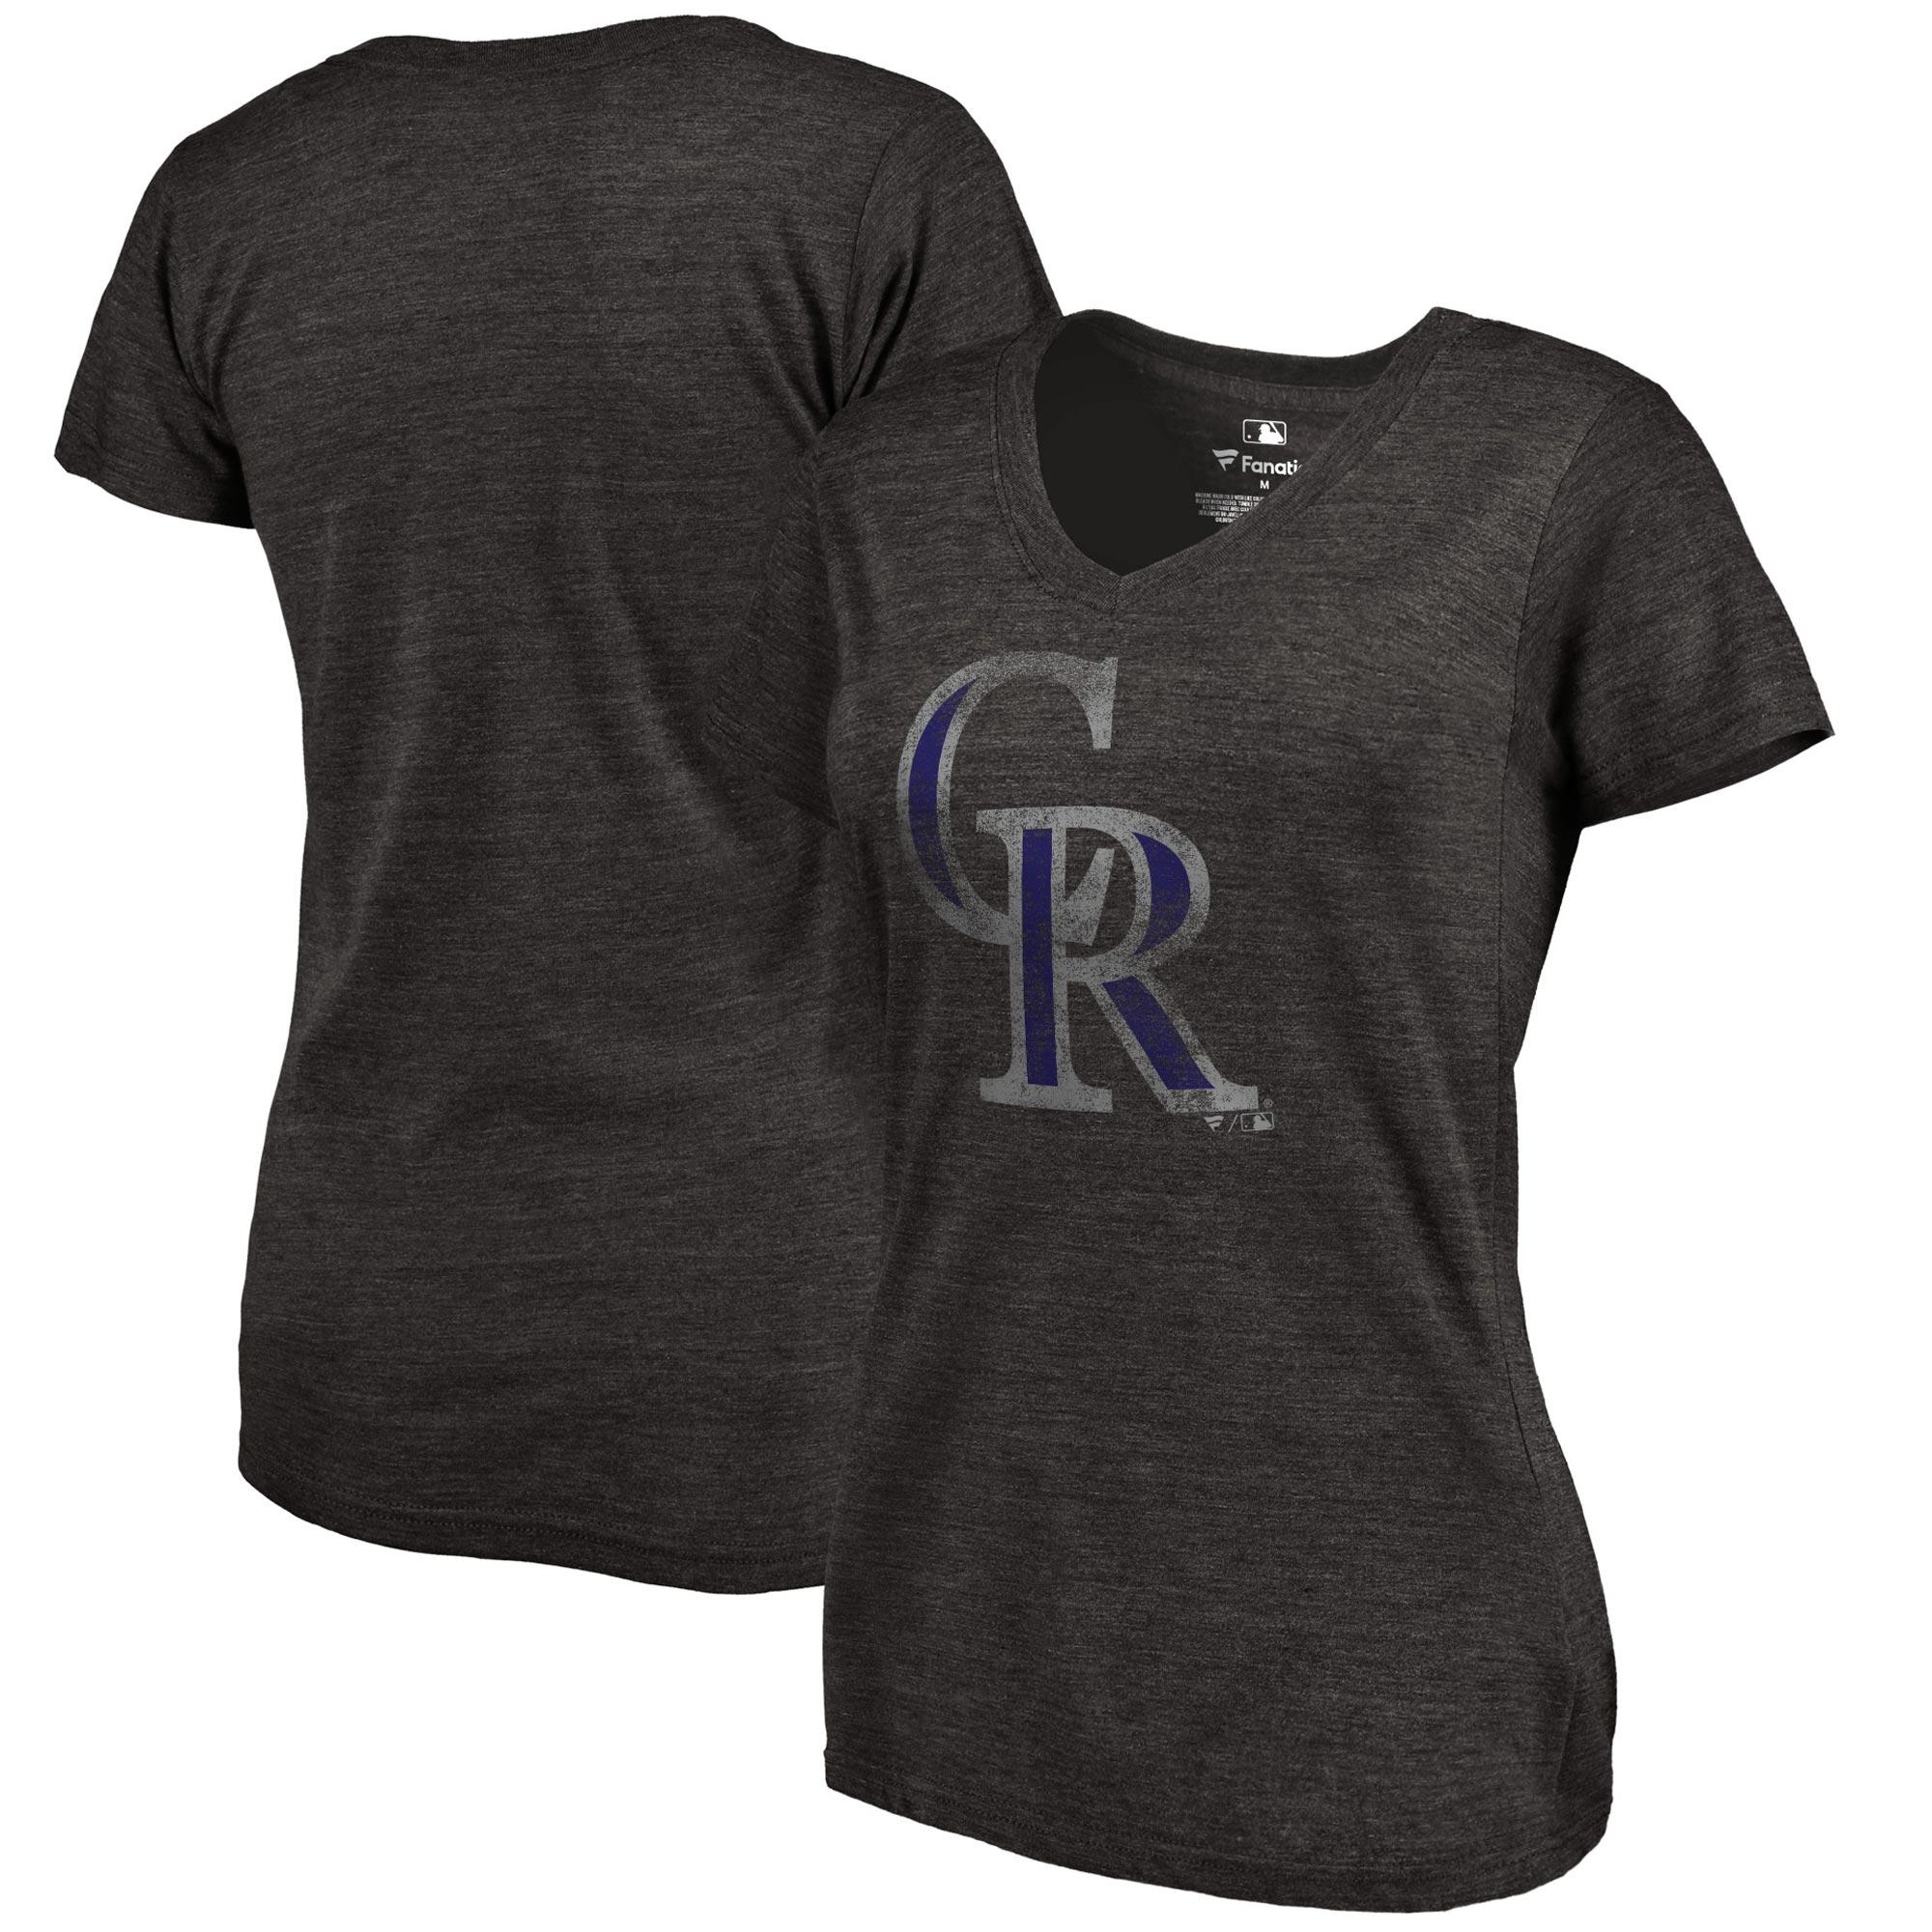 Colorado Rockies Fanatics Branded Women's Primary Distressed Team Tri-Blend V-Neck T-Shirt - Heathered Black